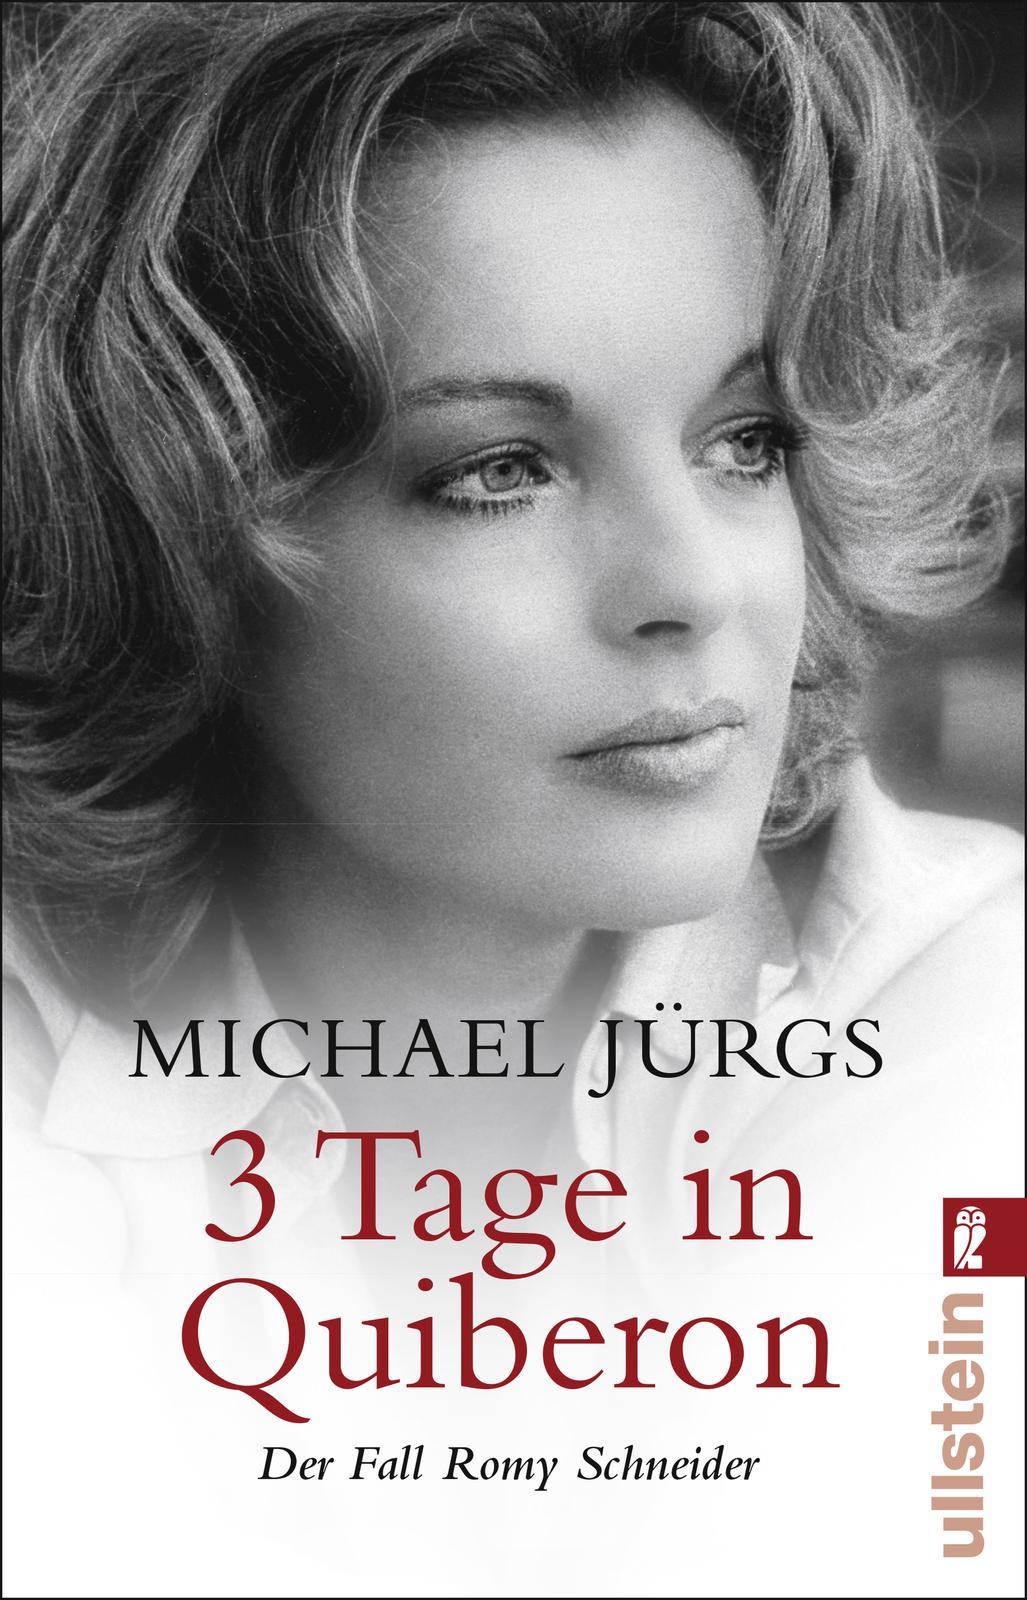 Michael Jürgs - 3 Tage in Quiberon